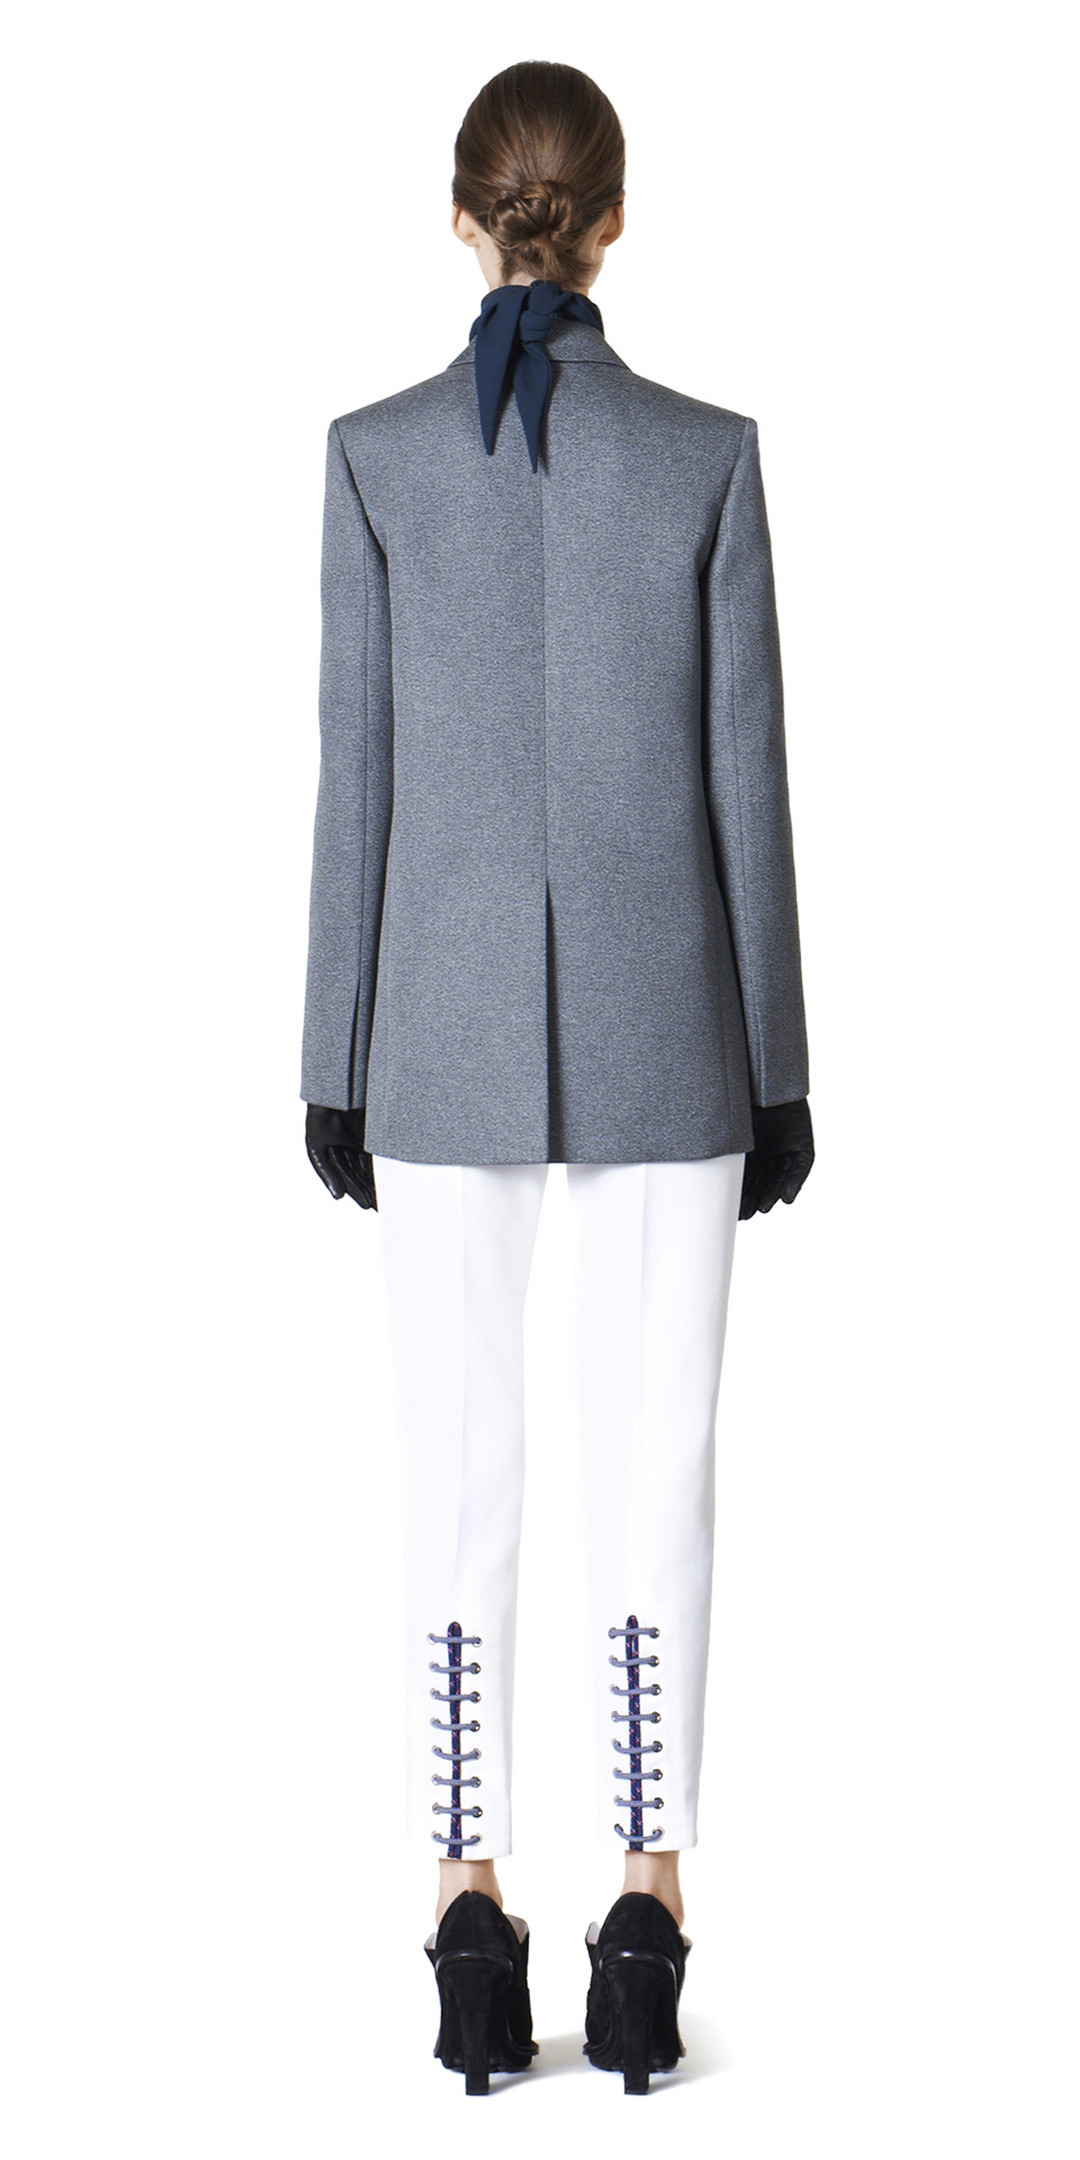 BALENCIAGA Jacket D Balenciaga Toggle Jacket i